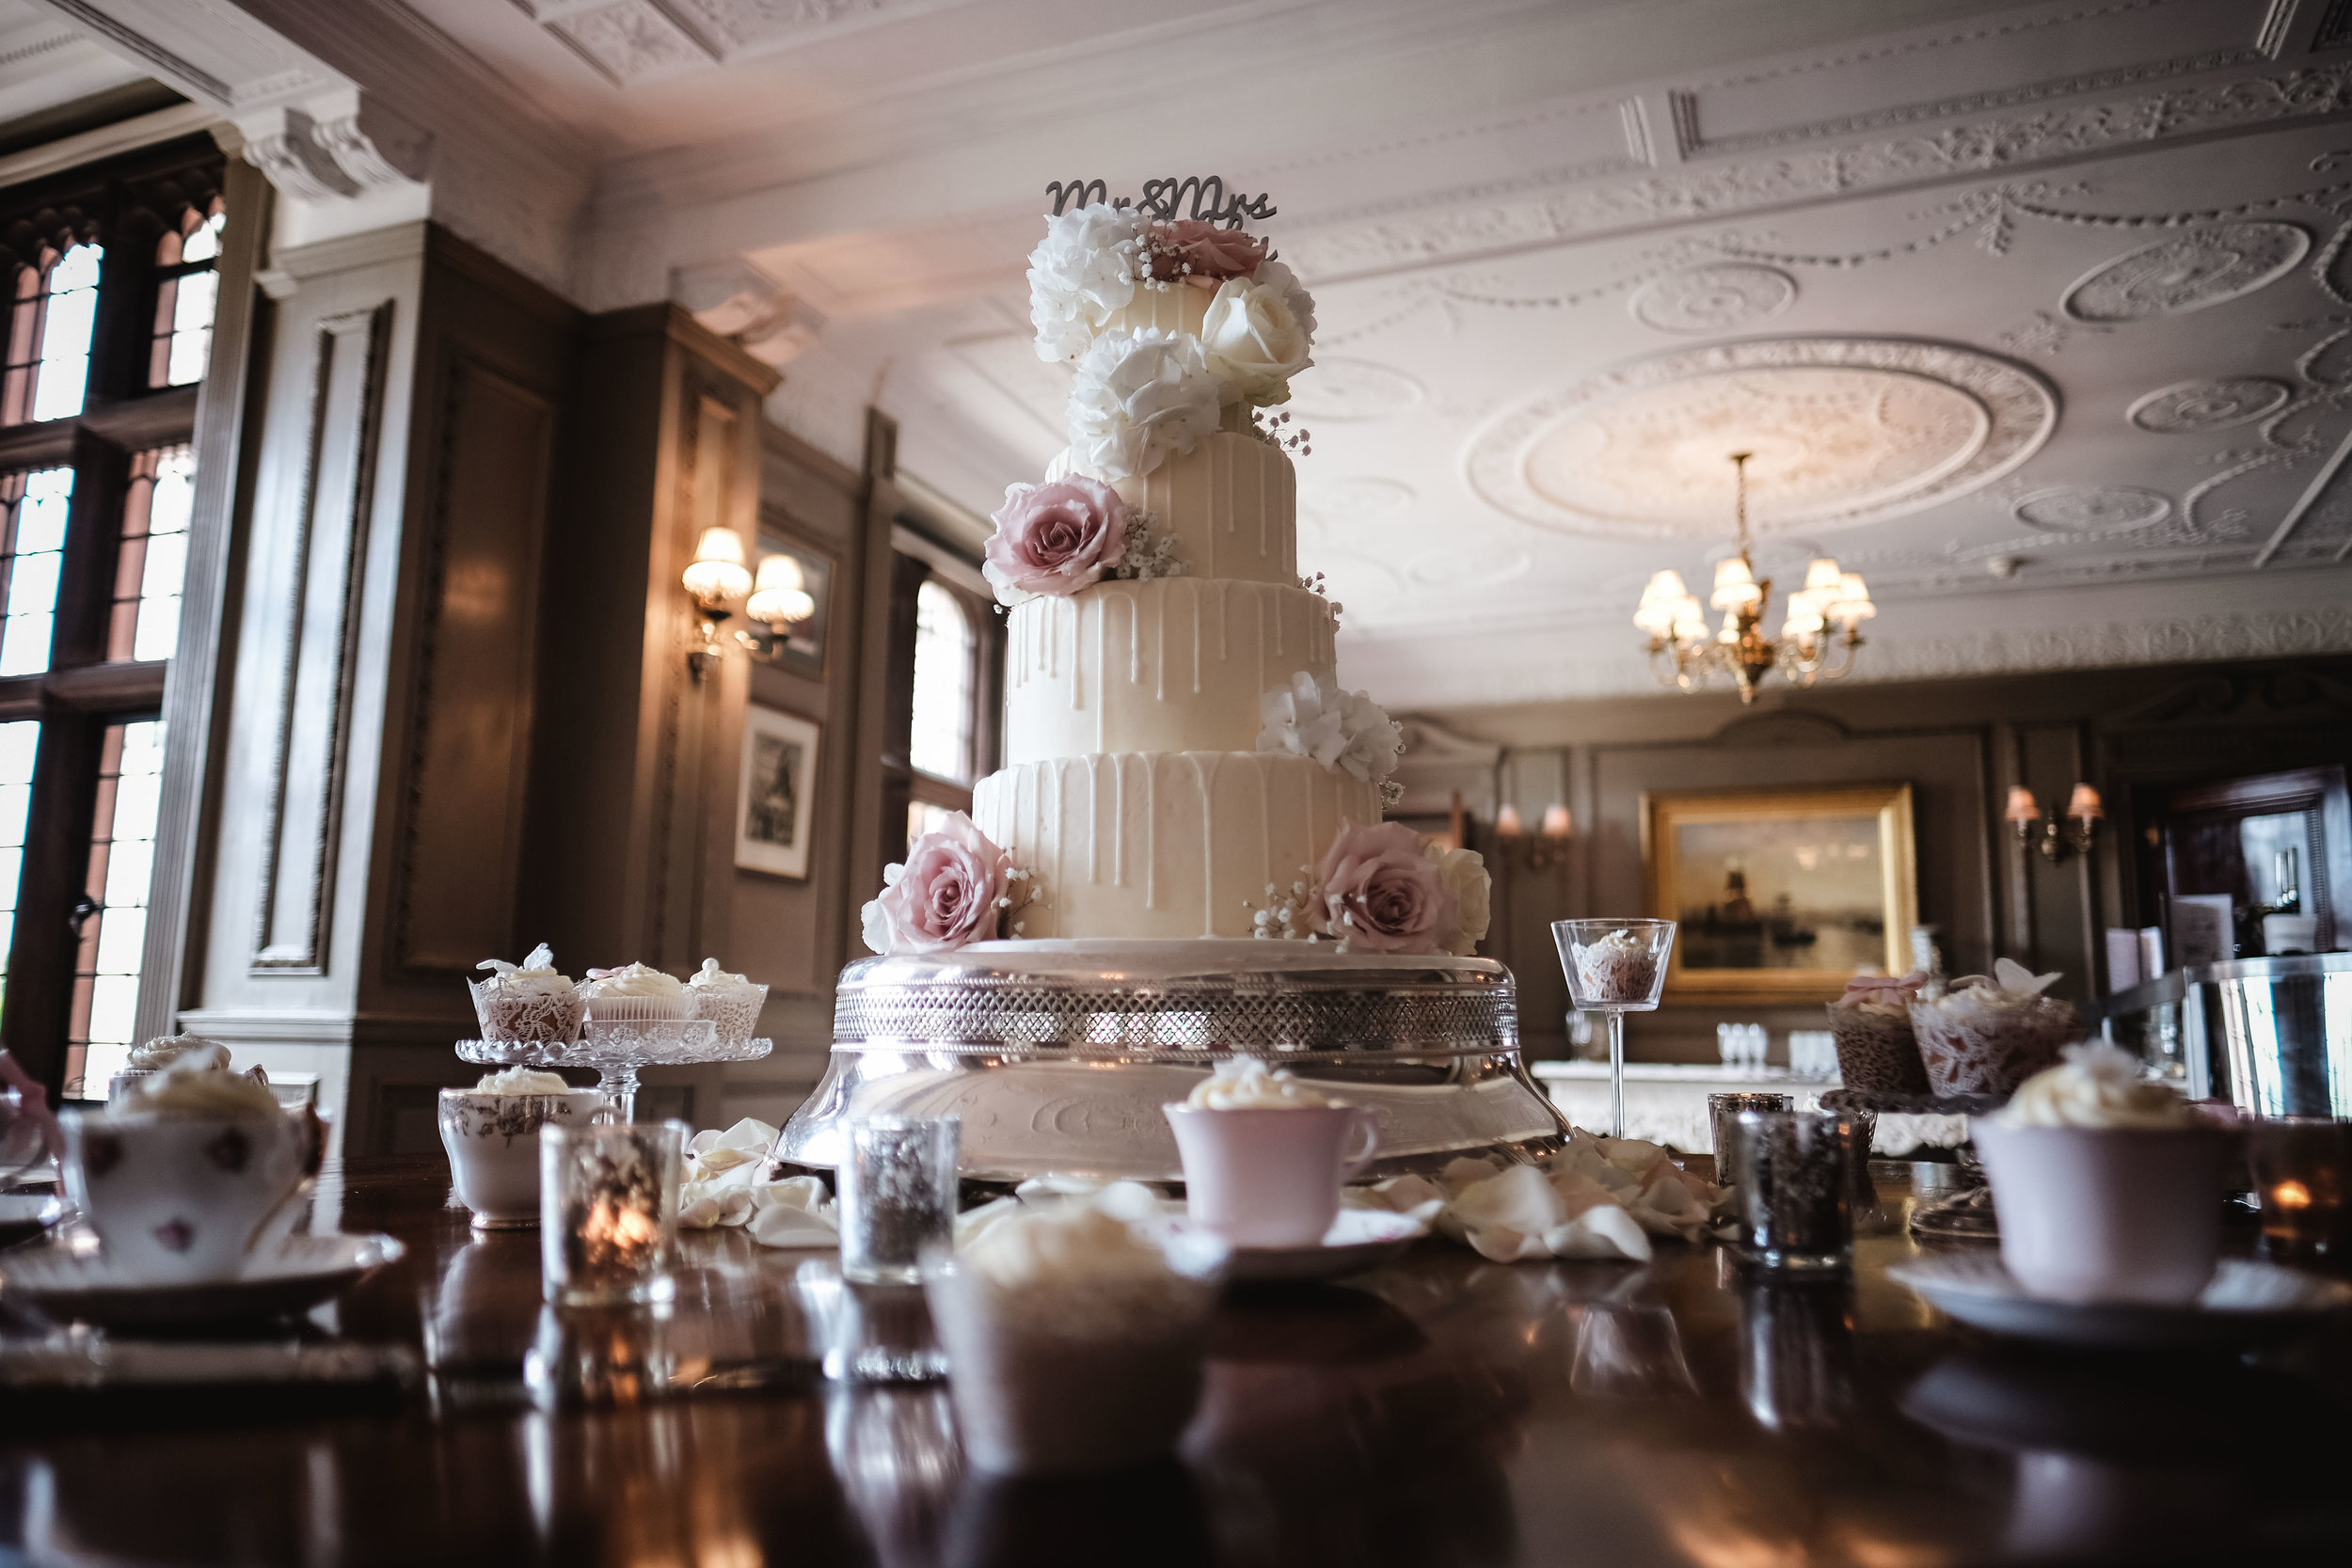 Thornton manor wedding photography cheshire wedding photographer liverpool manchester warrington chester wirral wedding BLOG (17 of 108).jpg